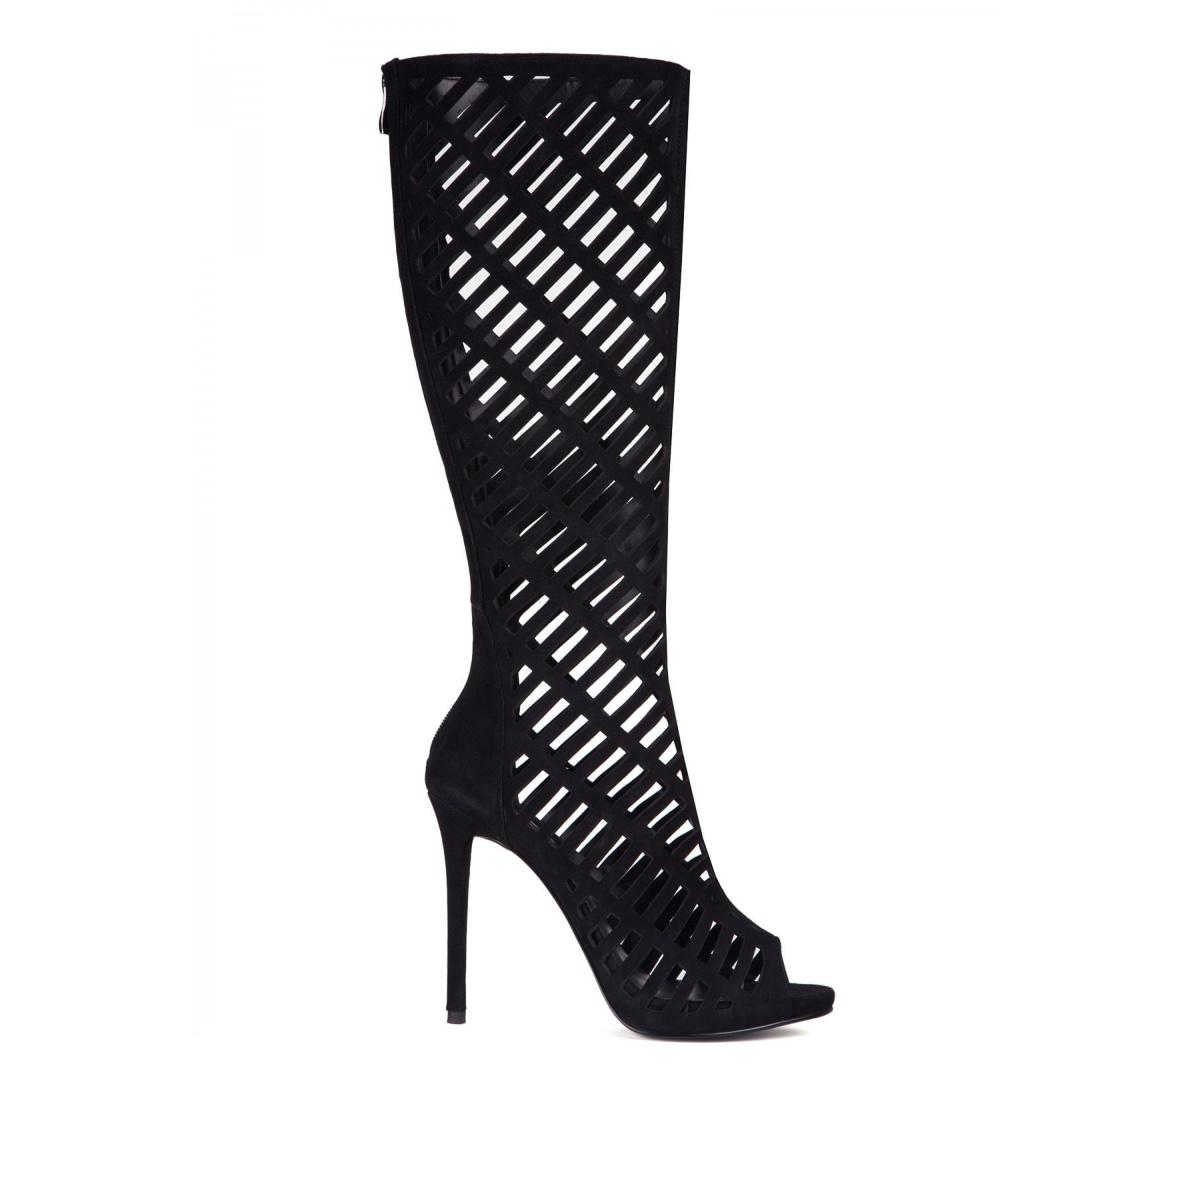 Sandale negre inalte din piele intoarsa perforata Negru